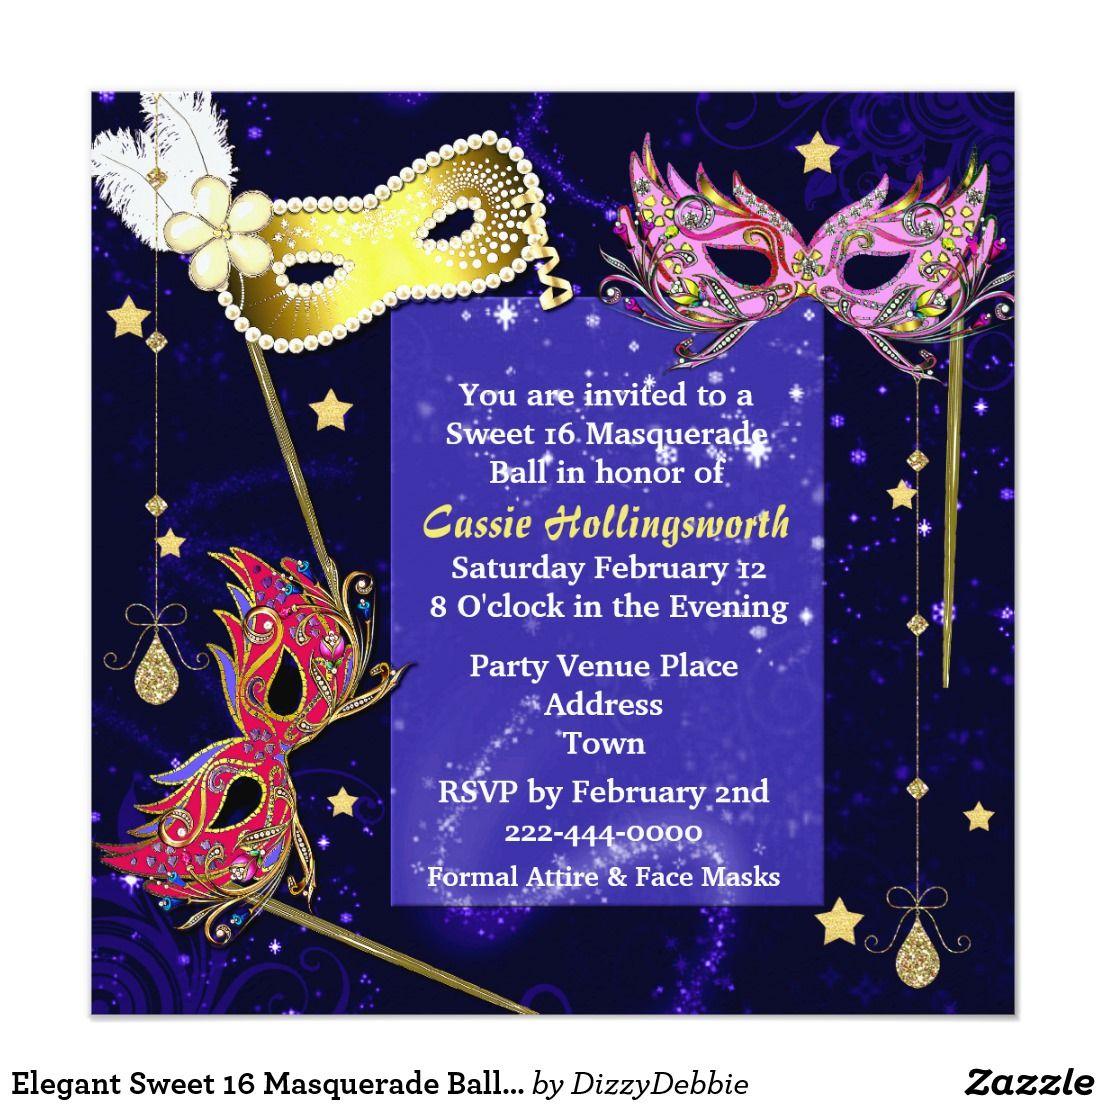 Elegant Sweet 16 Masquerade Ball Invitation | Sweet 16 masquerade ...